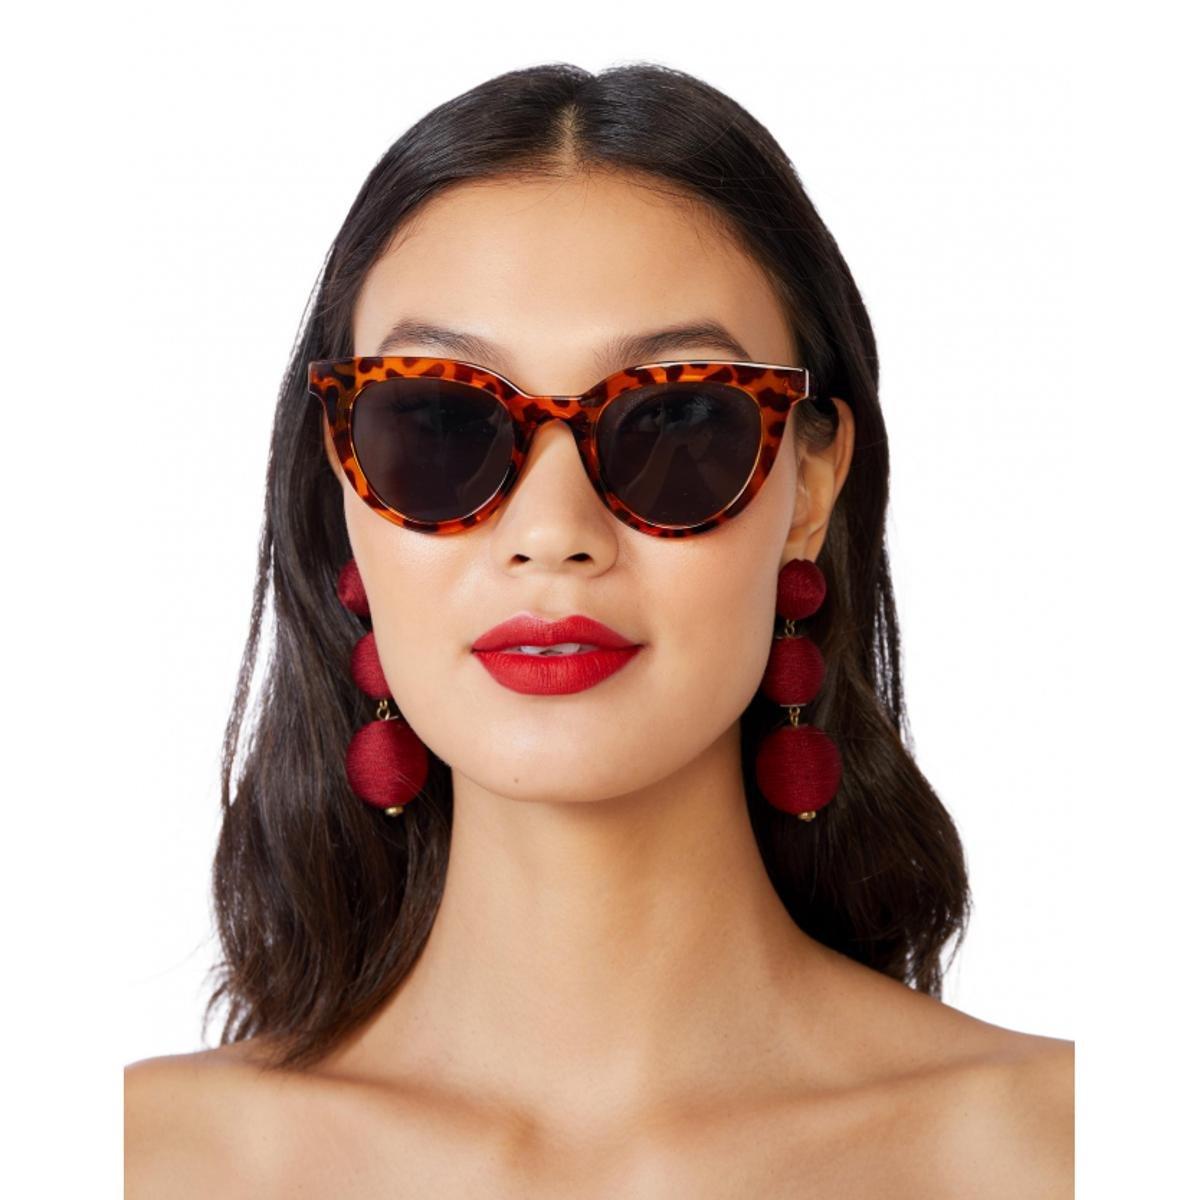 7ea325418b4d5 Óculos Amaro De Sol D Frame Detalhe Metal Feminino - Compre Agora ...